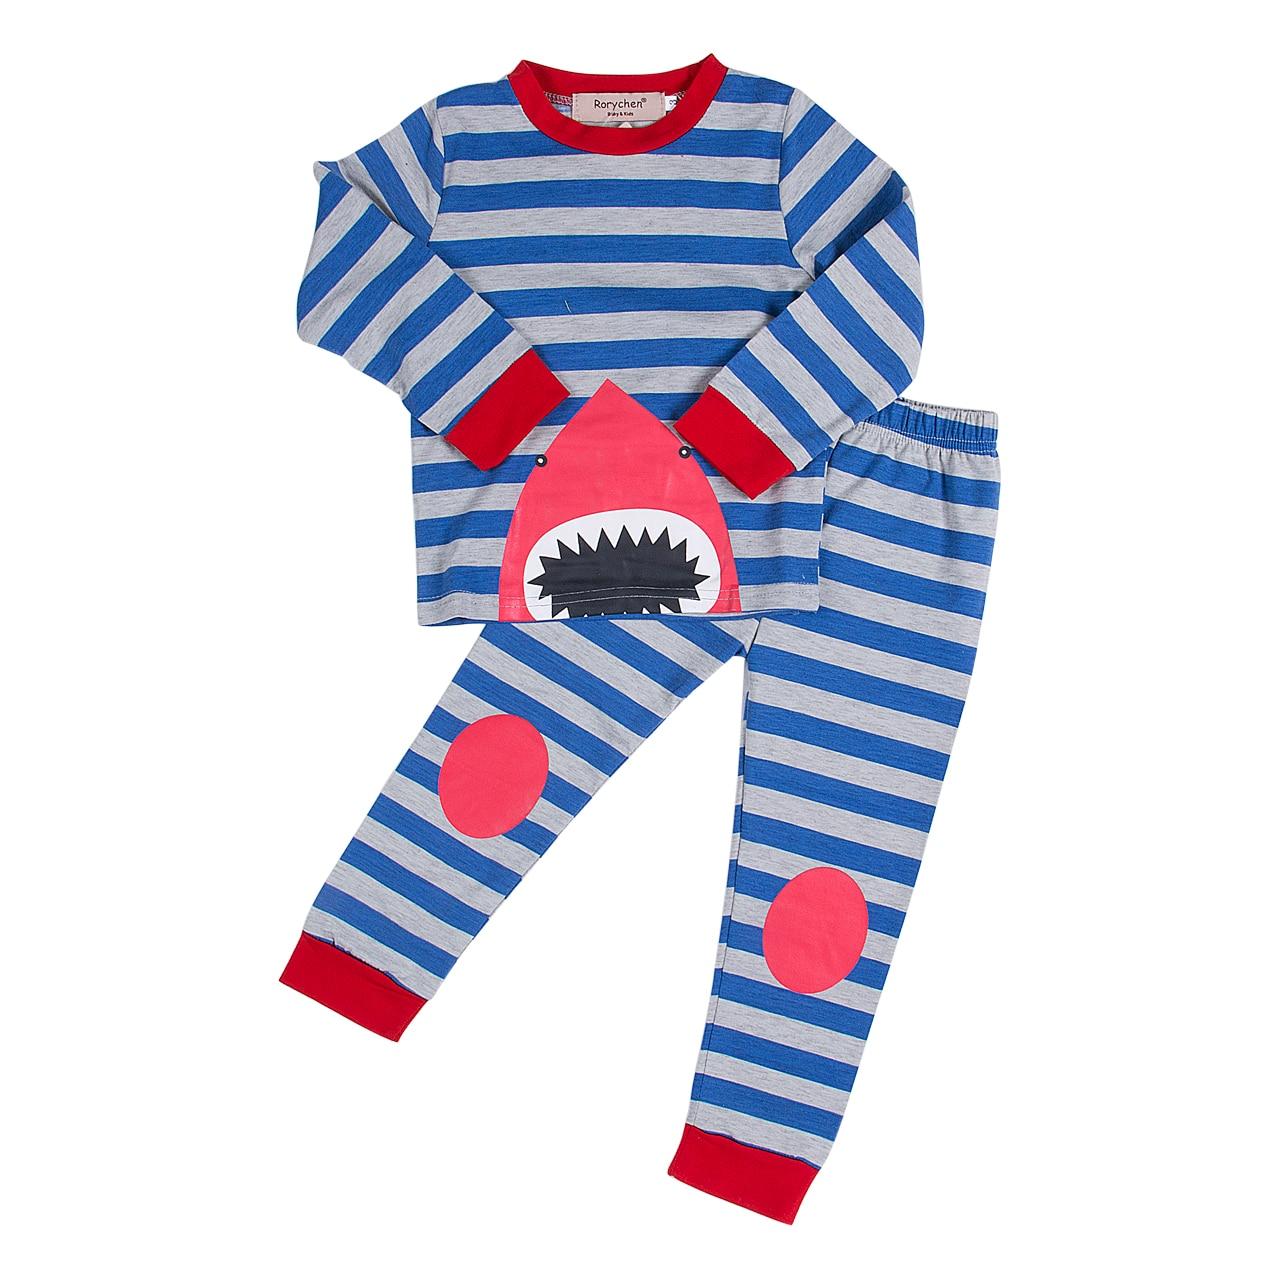 online buy whole boys shark pajamas from boys shark toddler kids striped shark sleepwear girls boys baby cute shark pajamas set sleepwear nightwear striped